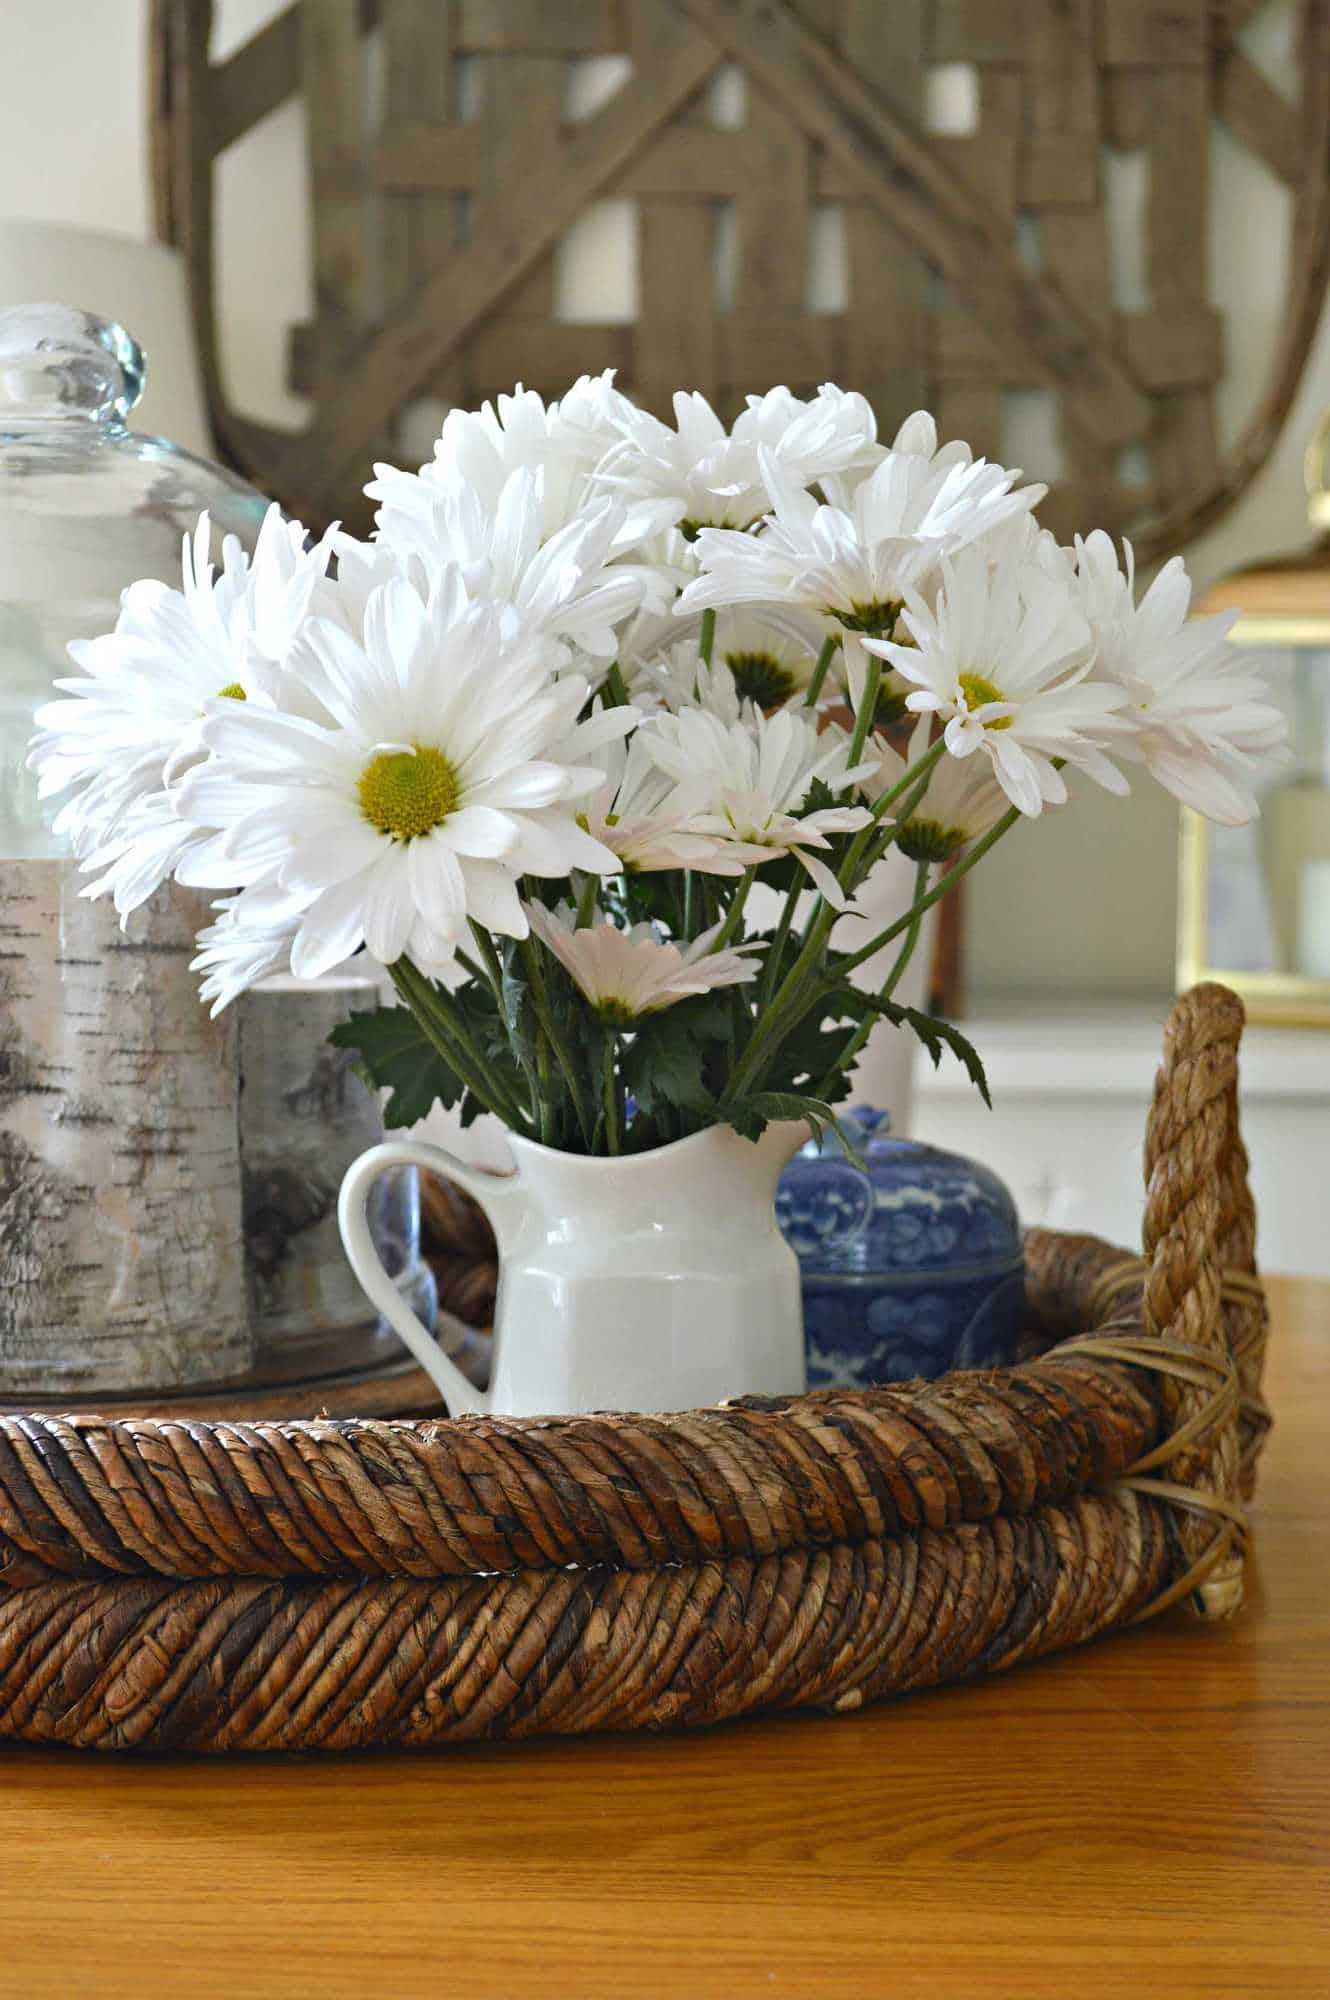 Beautiful vignette using color, texture and fresh flowers. chatfieldcourt.com